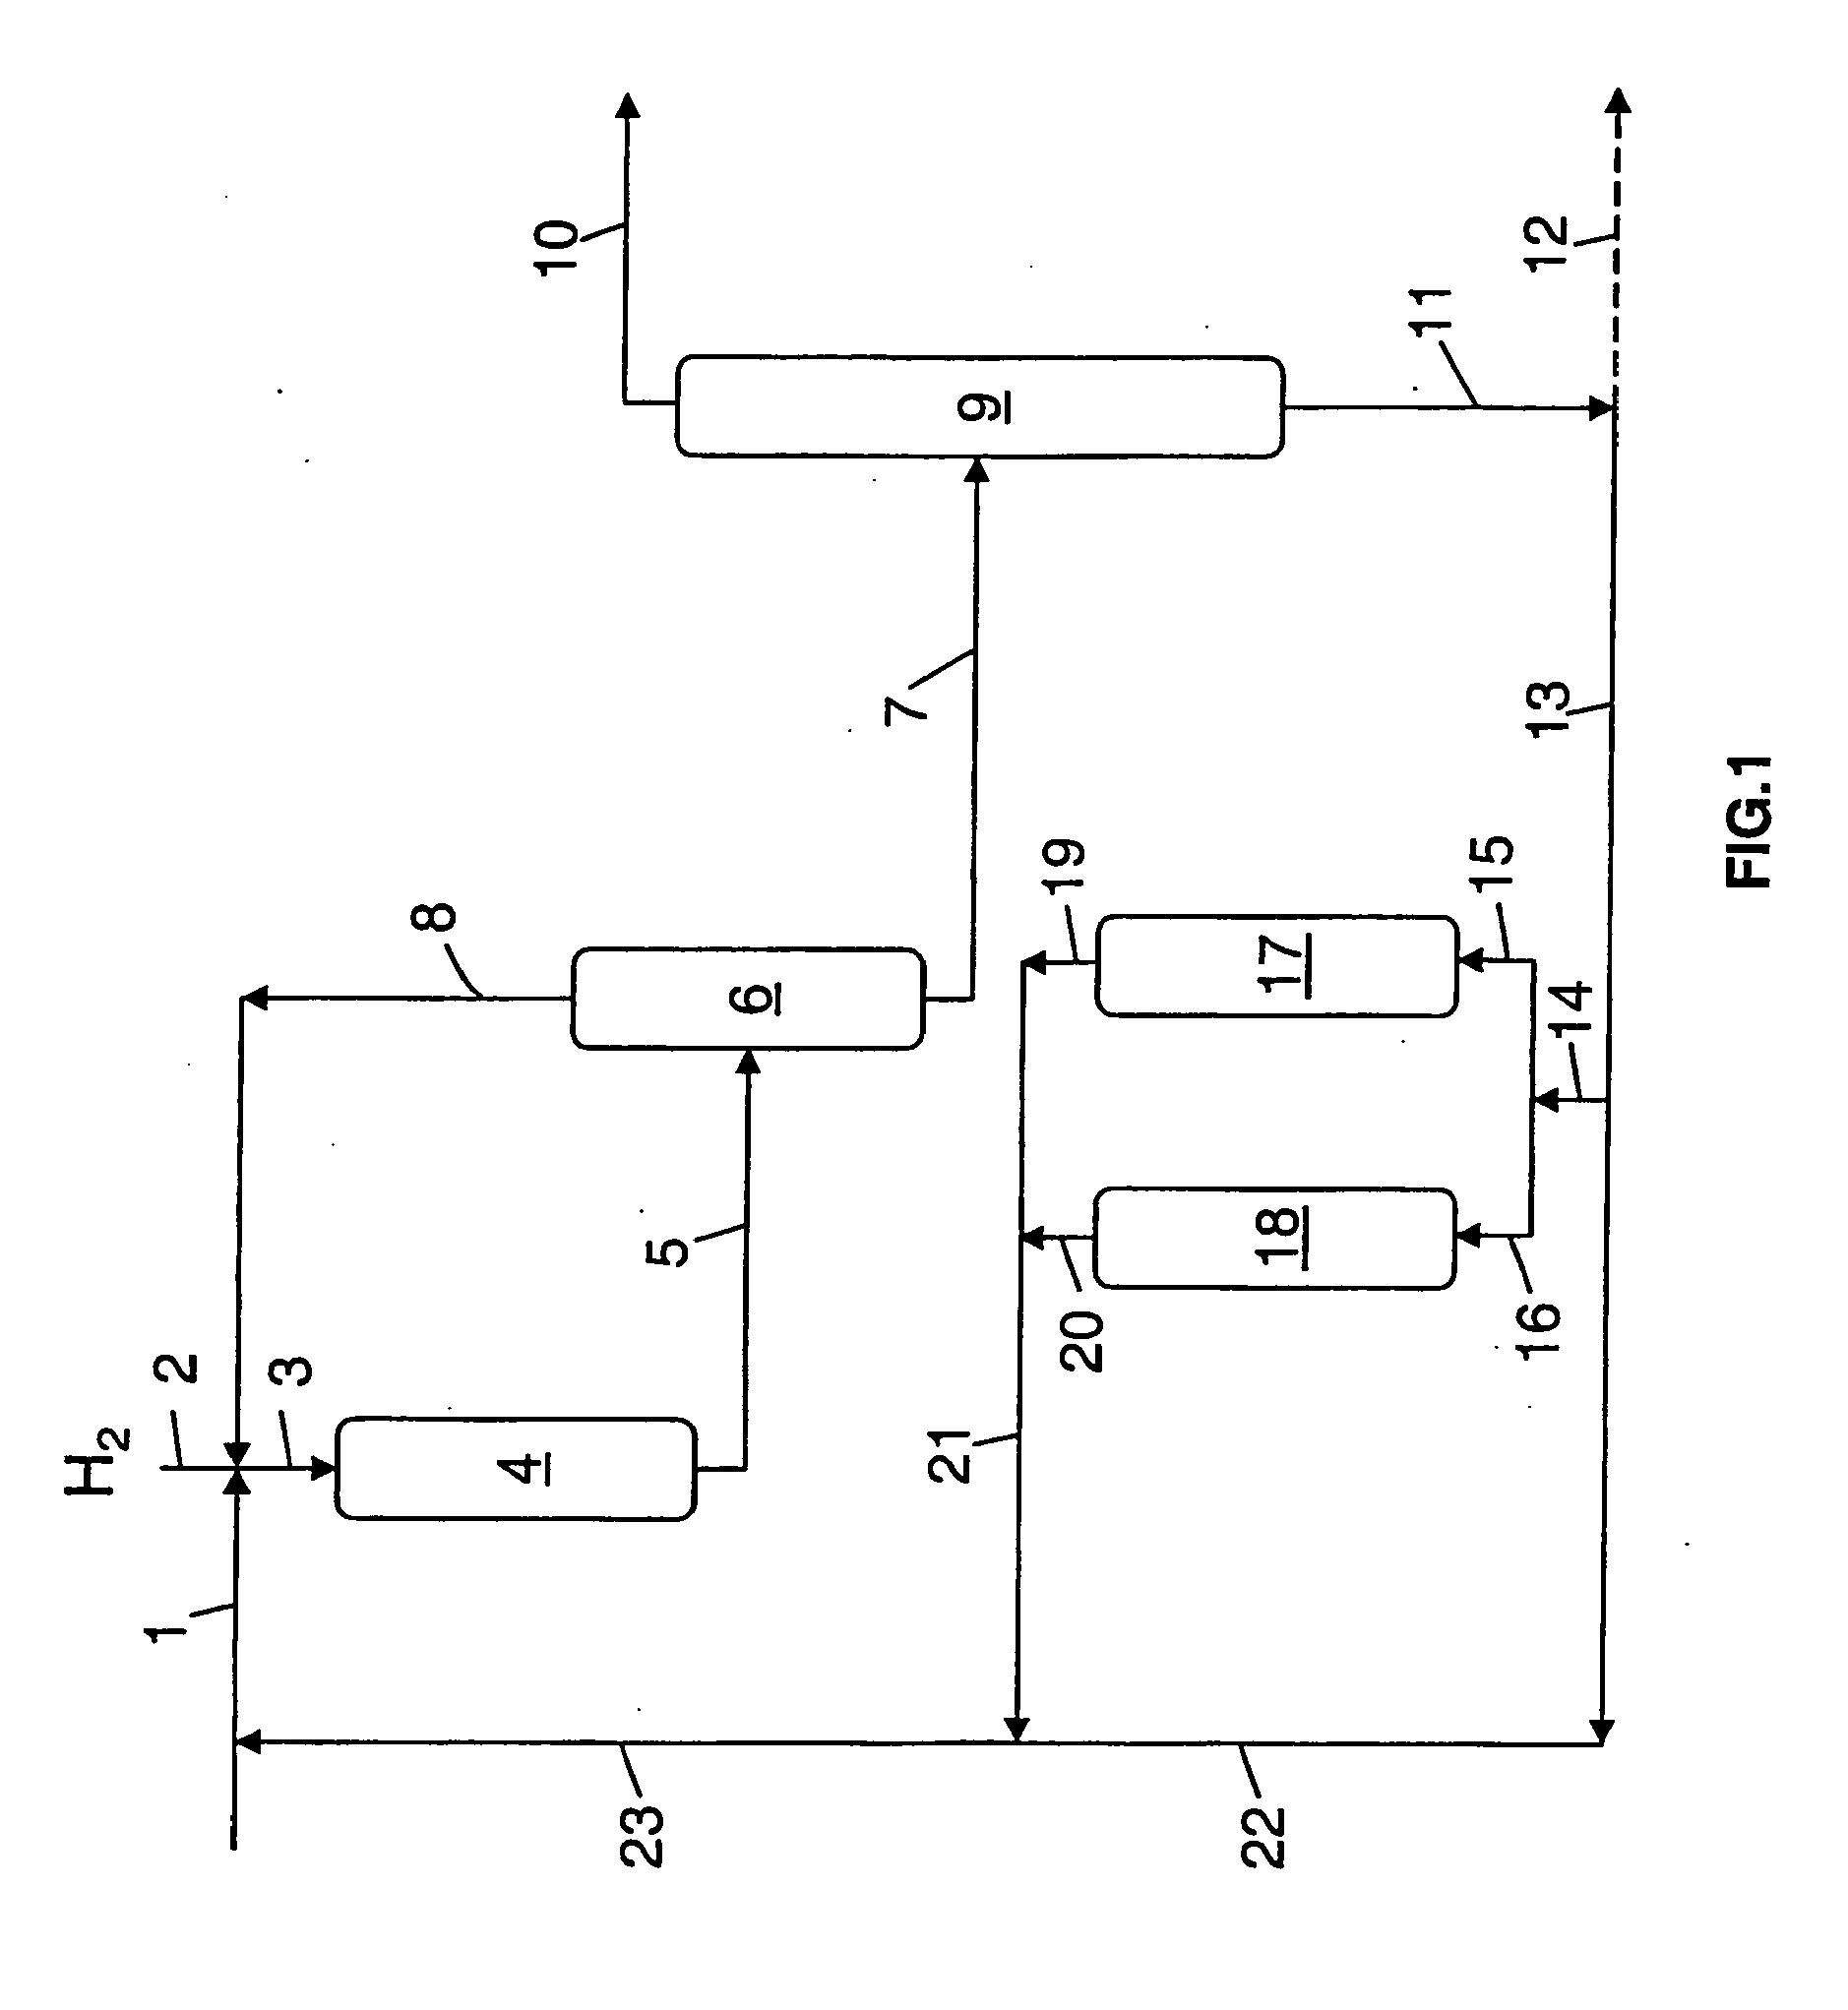 cd7388cz电路图